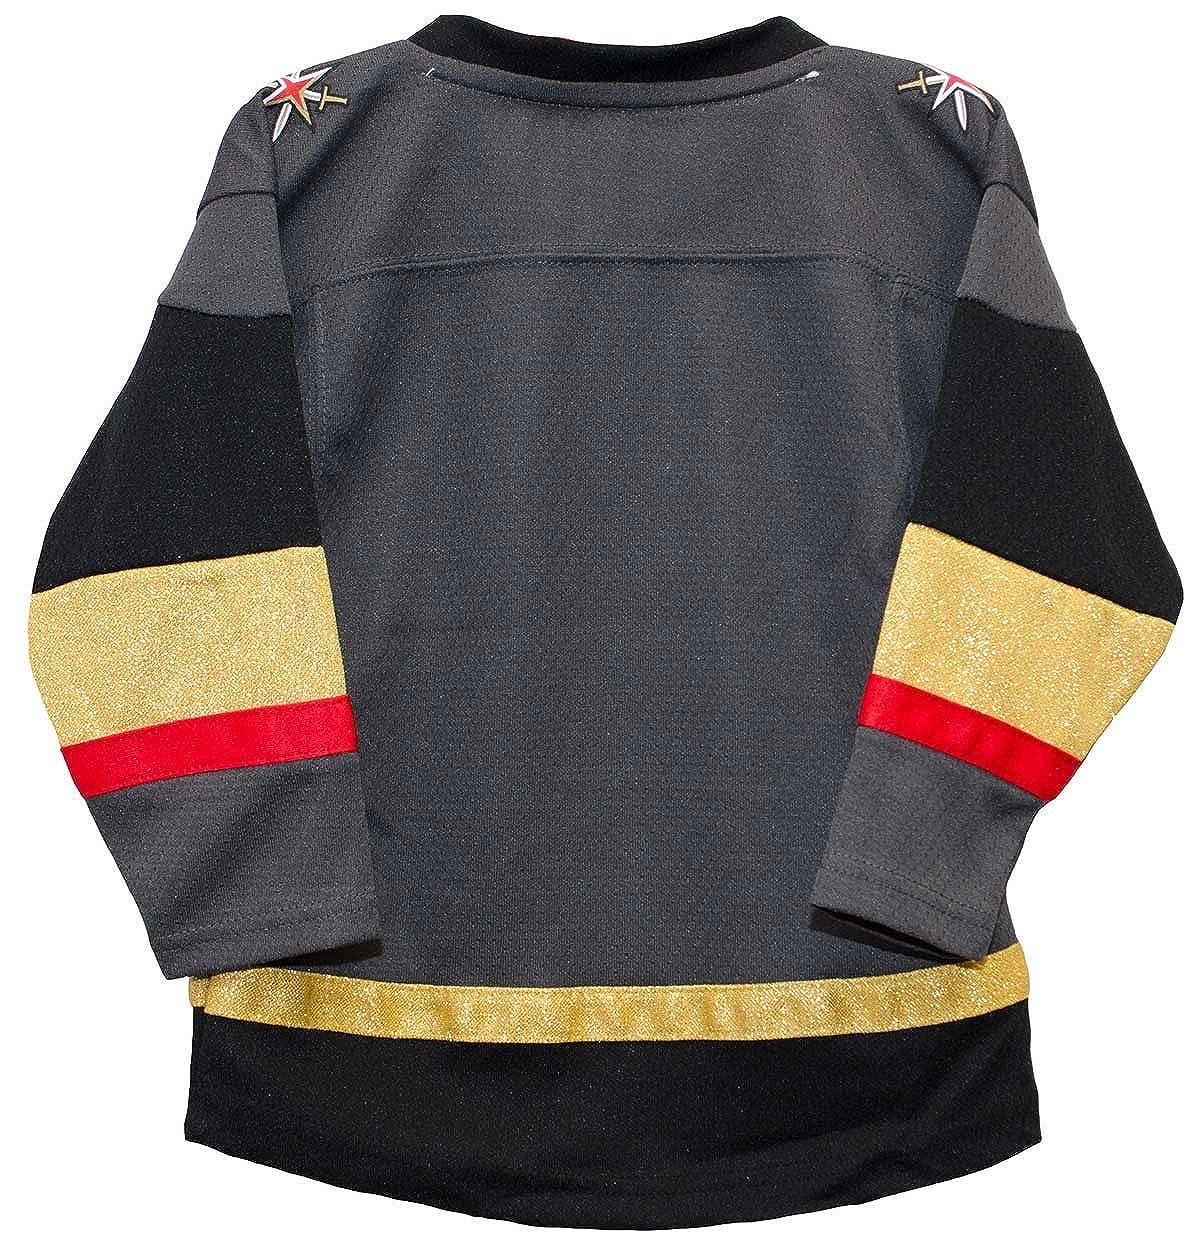 the best attitude f8feb 2c90d Outerstuff Vegas Golden Knights Toddler Home Jersey (Toddler 2T-4T)